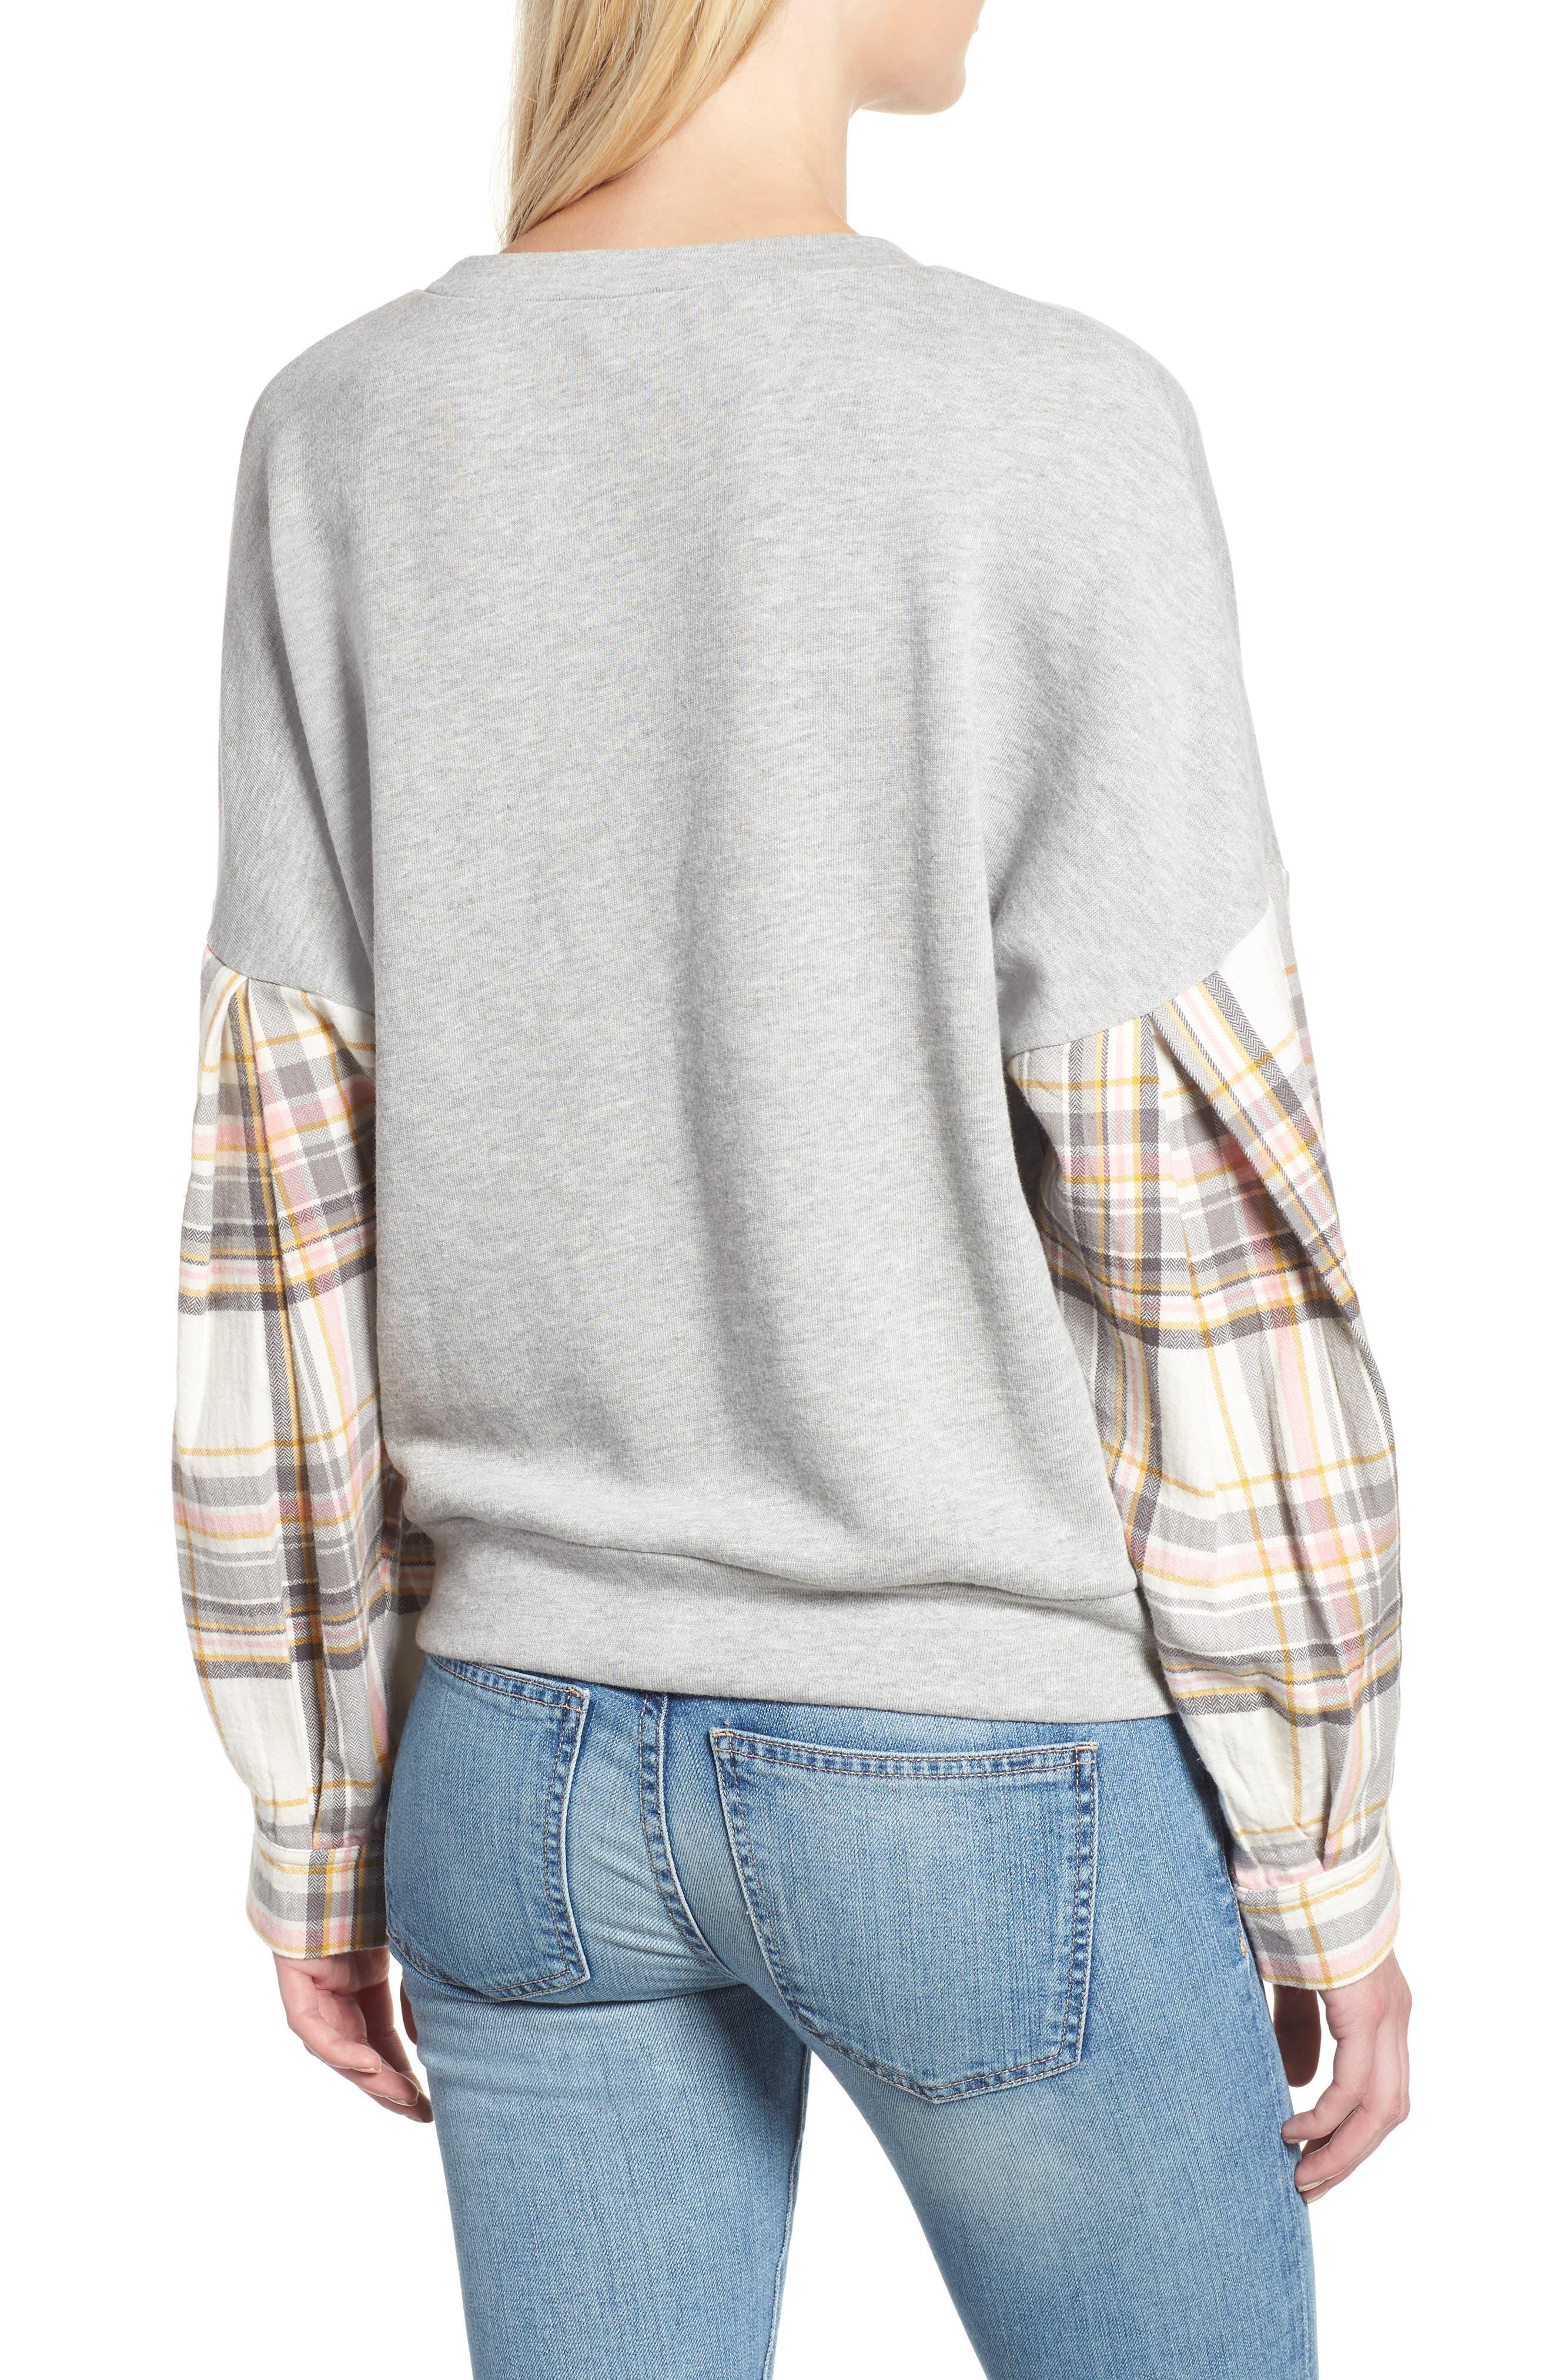 Flannel Sleeve Sweatshirt,                             Alternate thumbnail 2, color,                             030